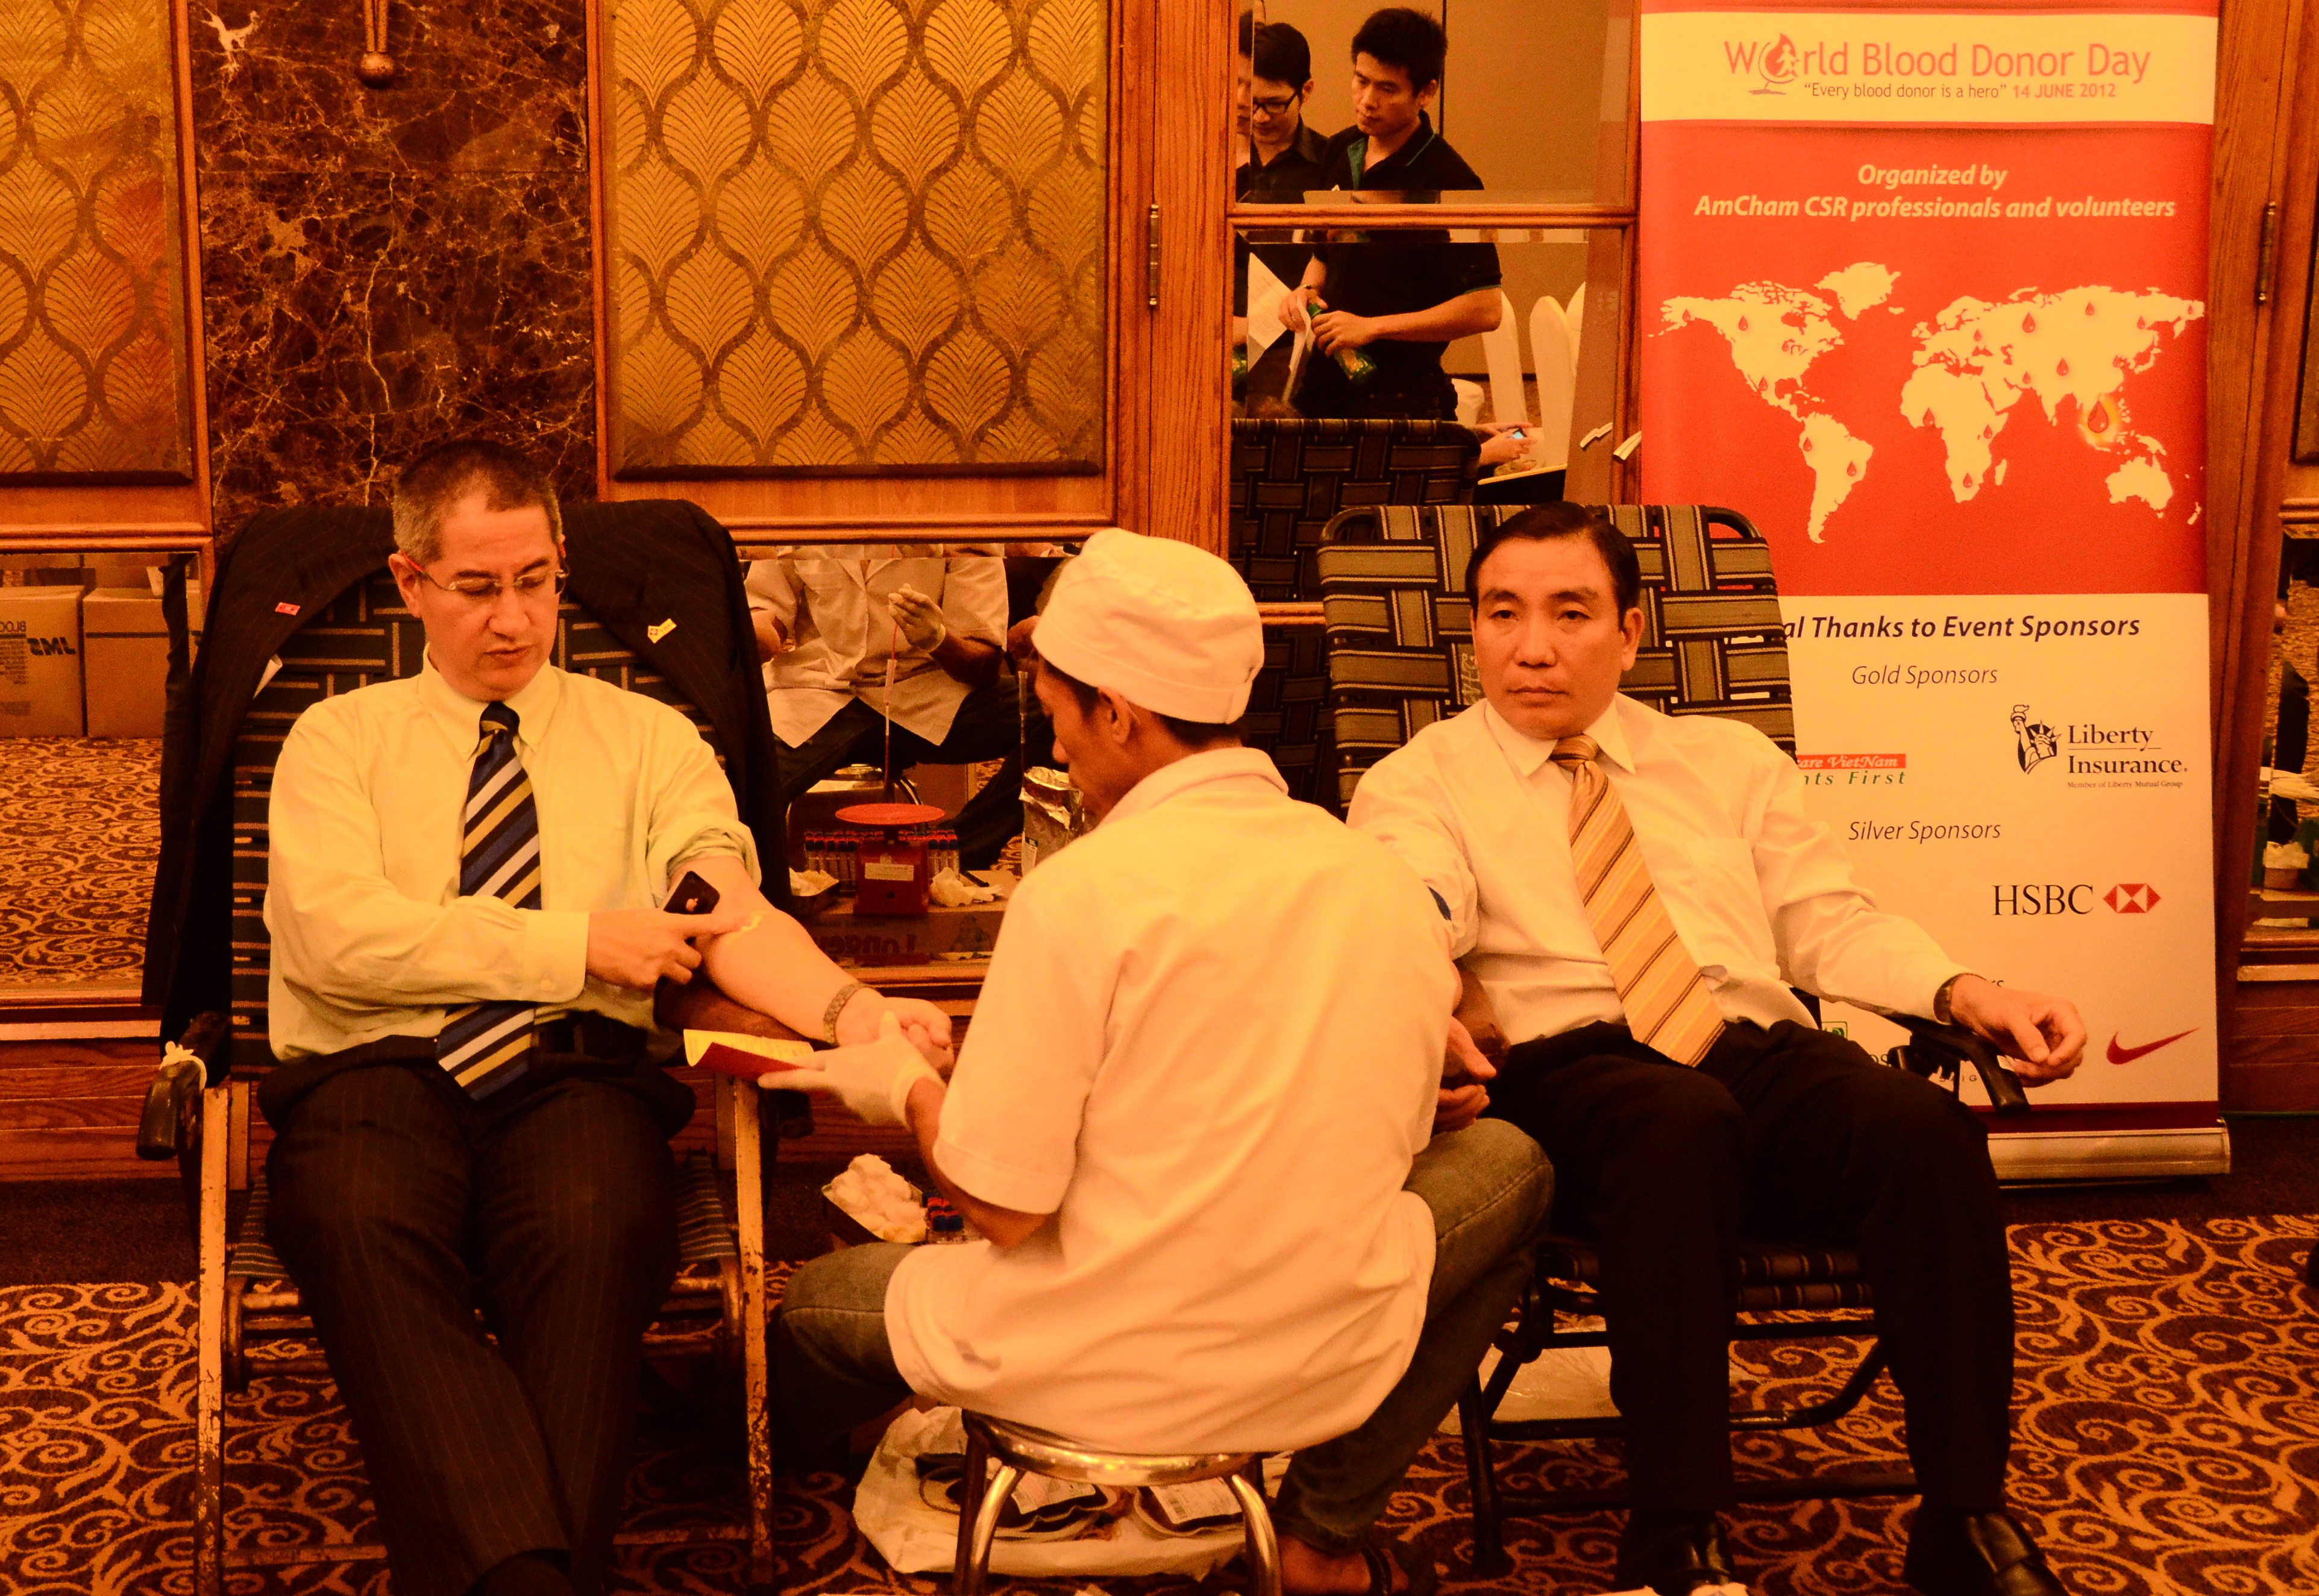 TRG International joins AmCham World Blood Donor Day